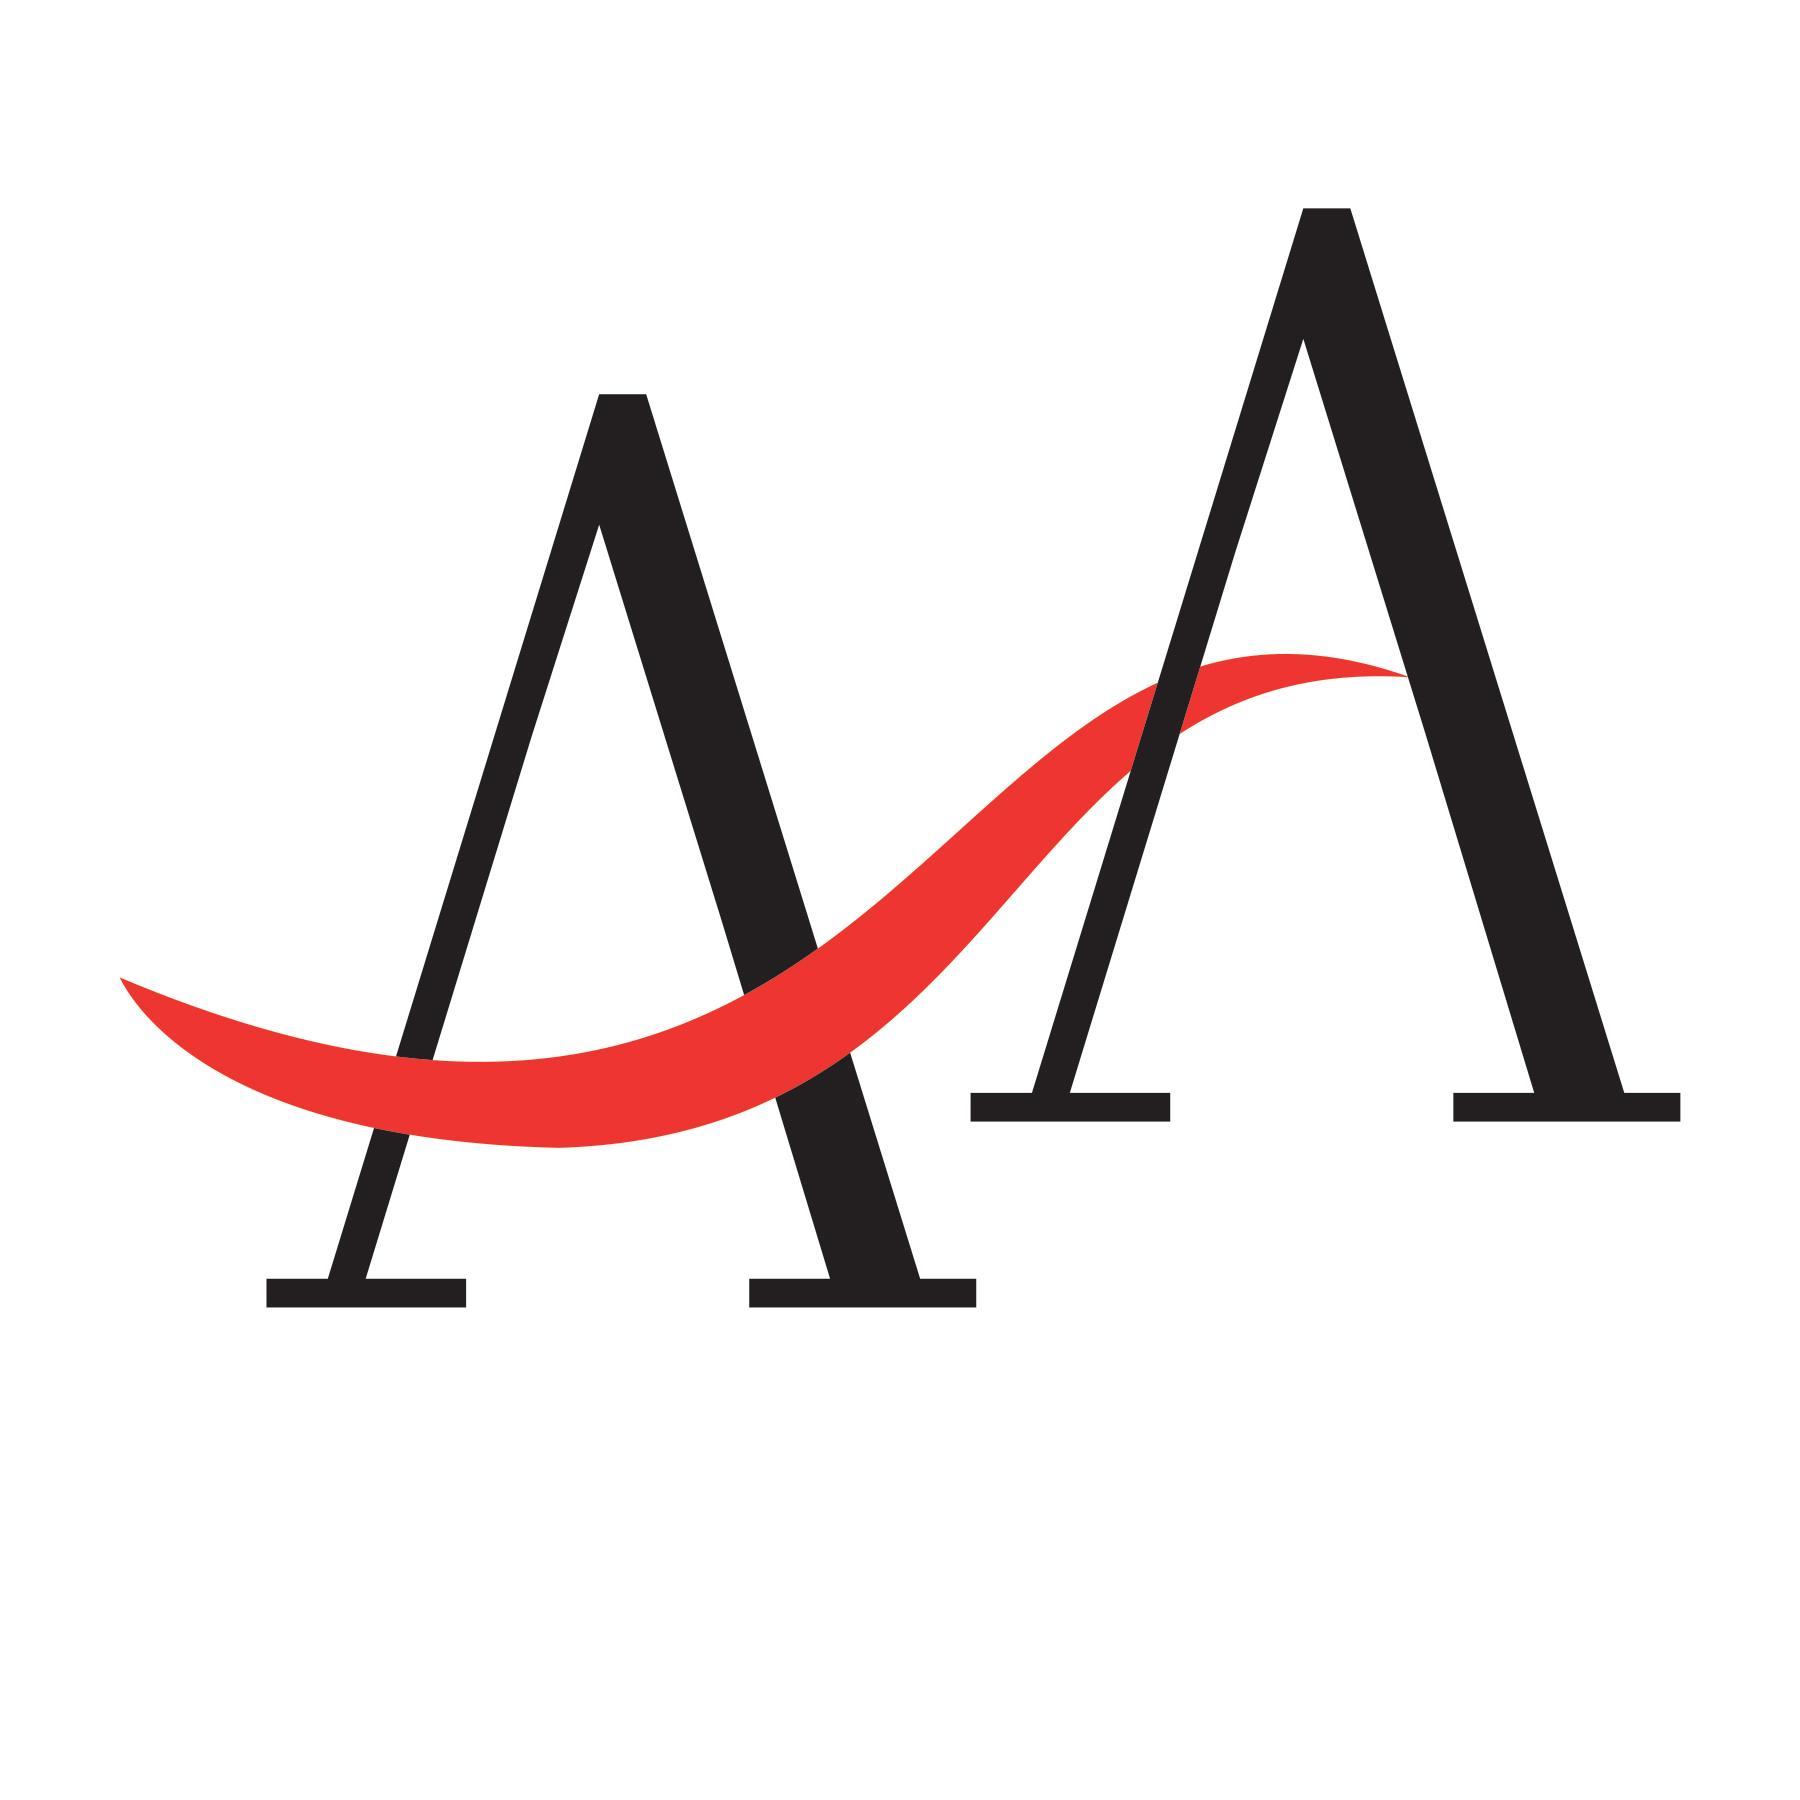 Affinity Alliance Mortgage & Real Estate image 4